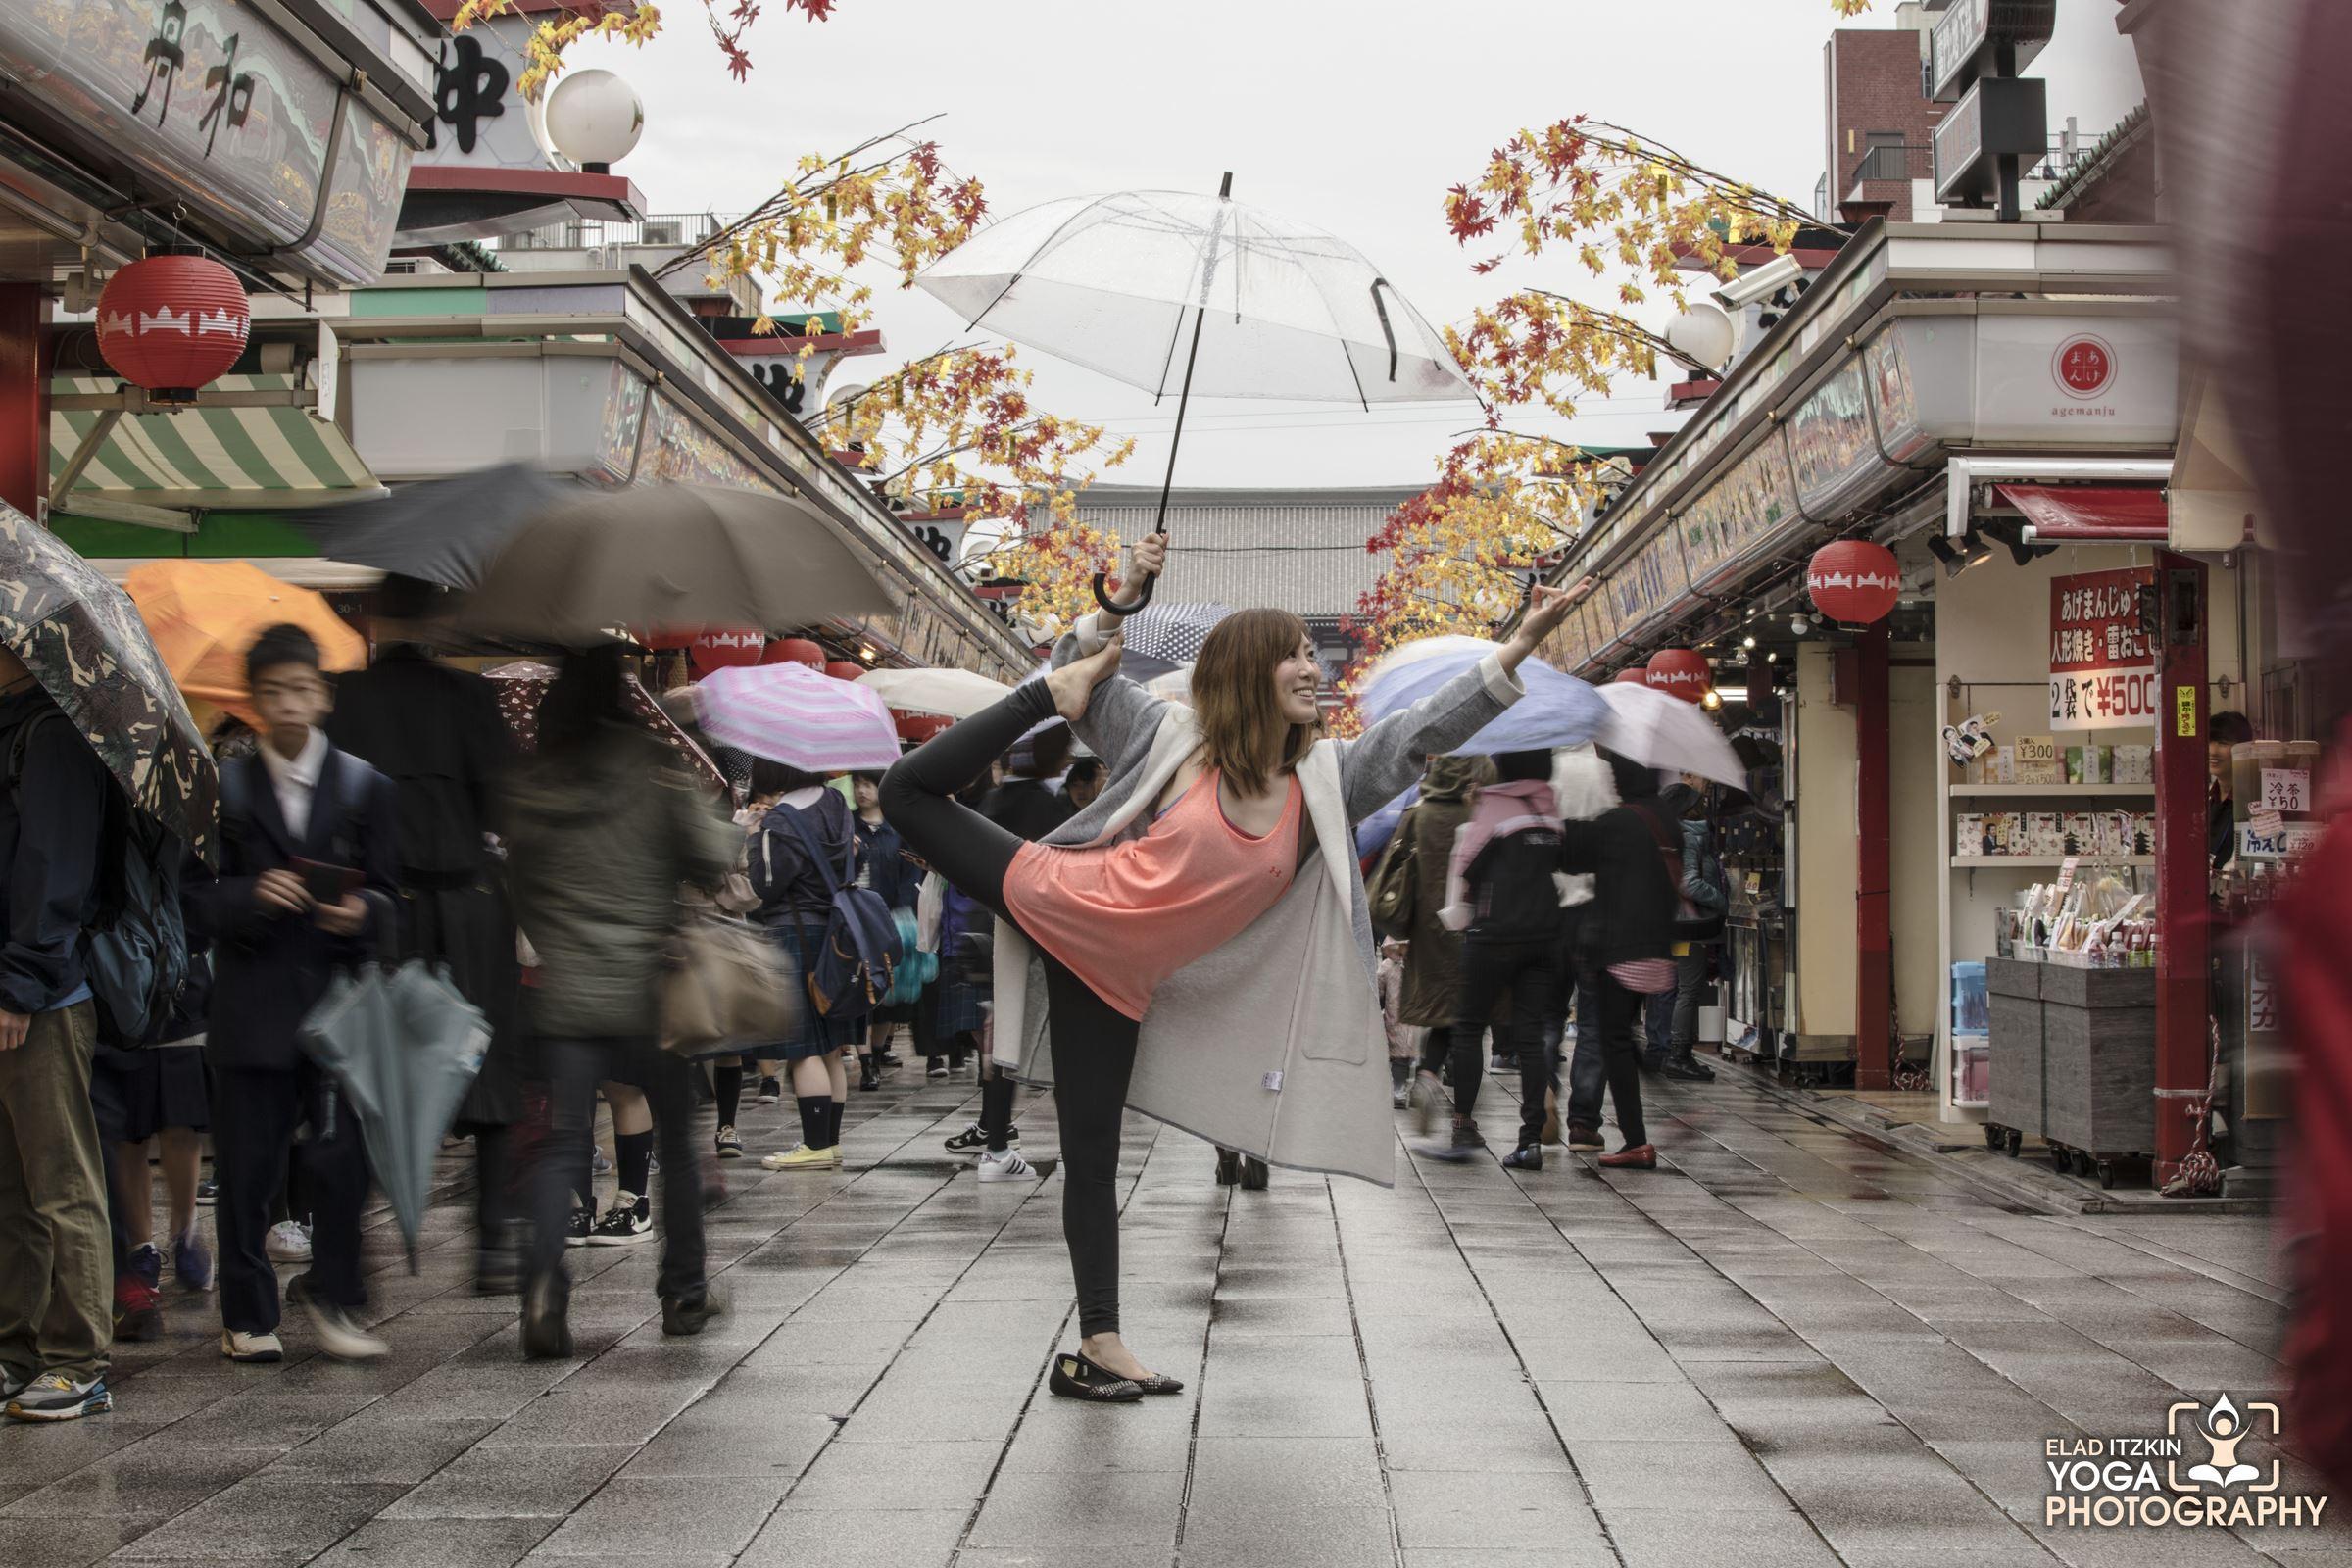 Elad Itzkin Yoga Photography - Arisa Kinoshita 8521